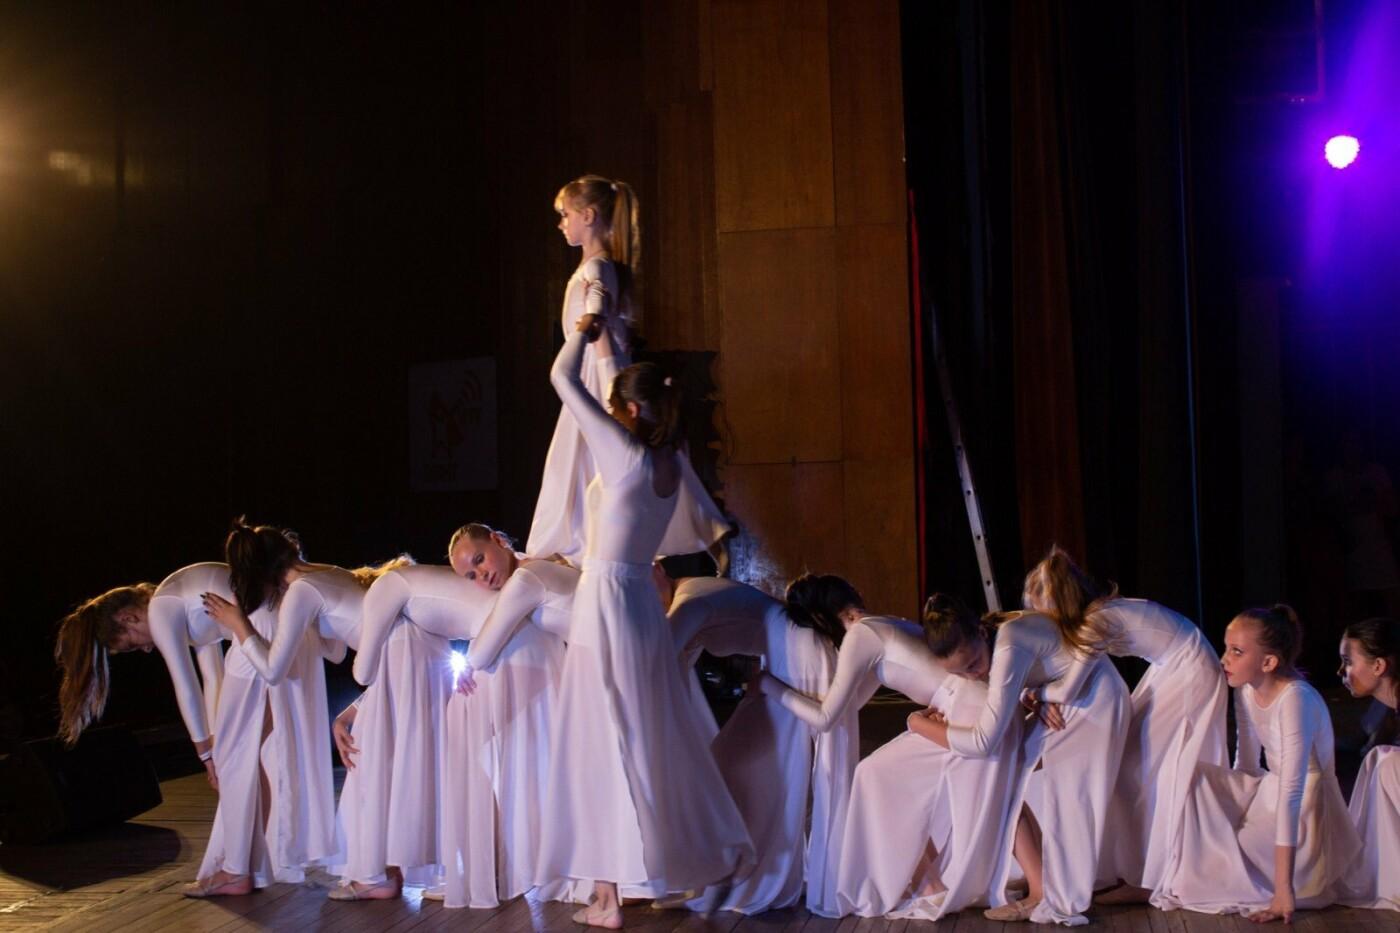 «Поверь в себя»: в Бердянске посвятили концерт проблемам молодежи, фото-1